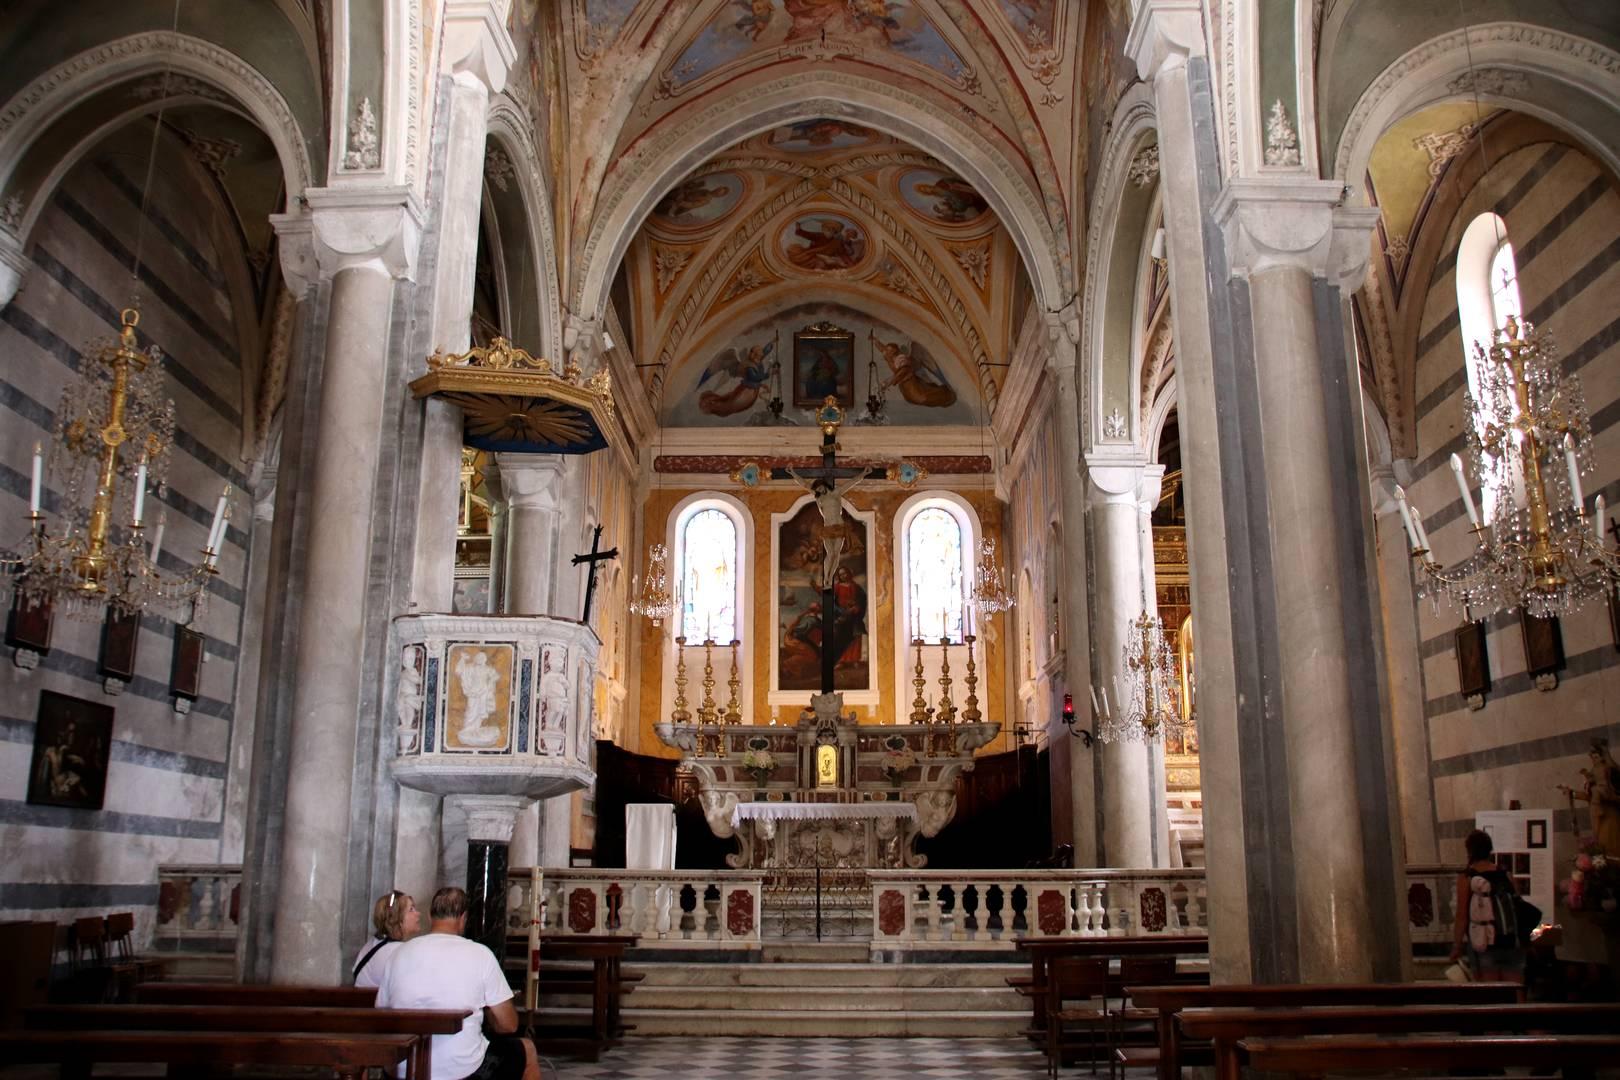 Italie - Eglise de Corniglia, parc des cinque terre